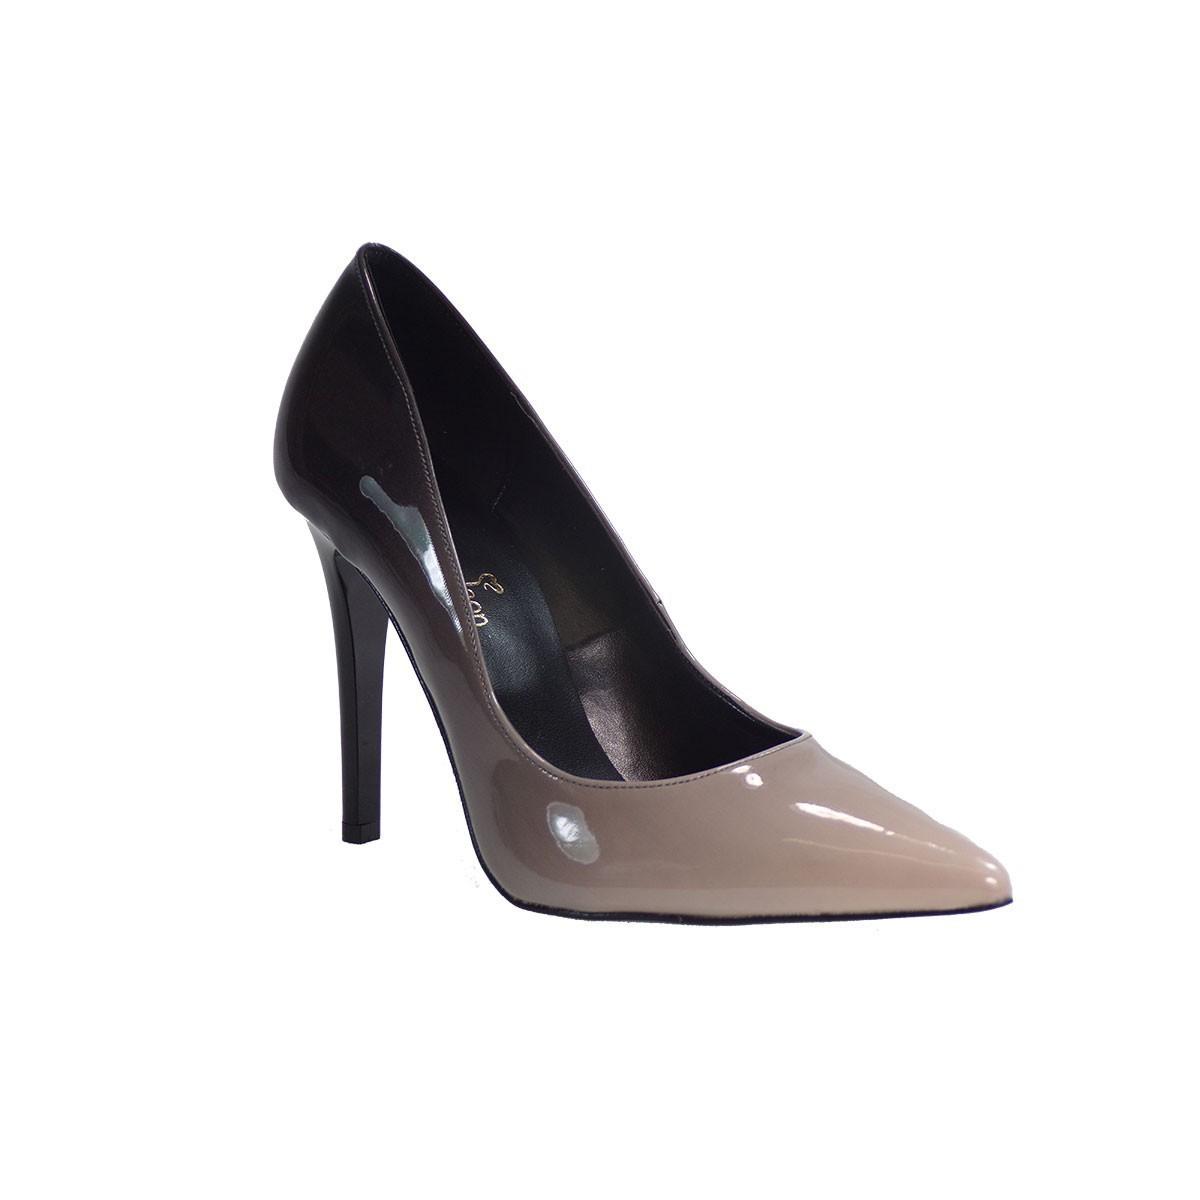 Fashion Icon Γυναικεία Παπούτσια Γόβα f09-06552 Nude